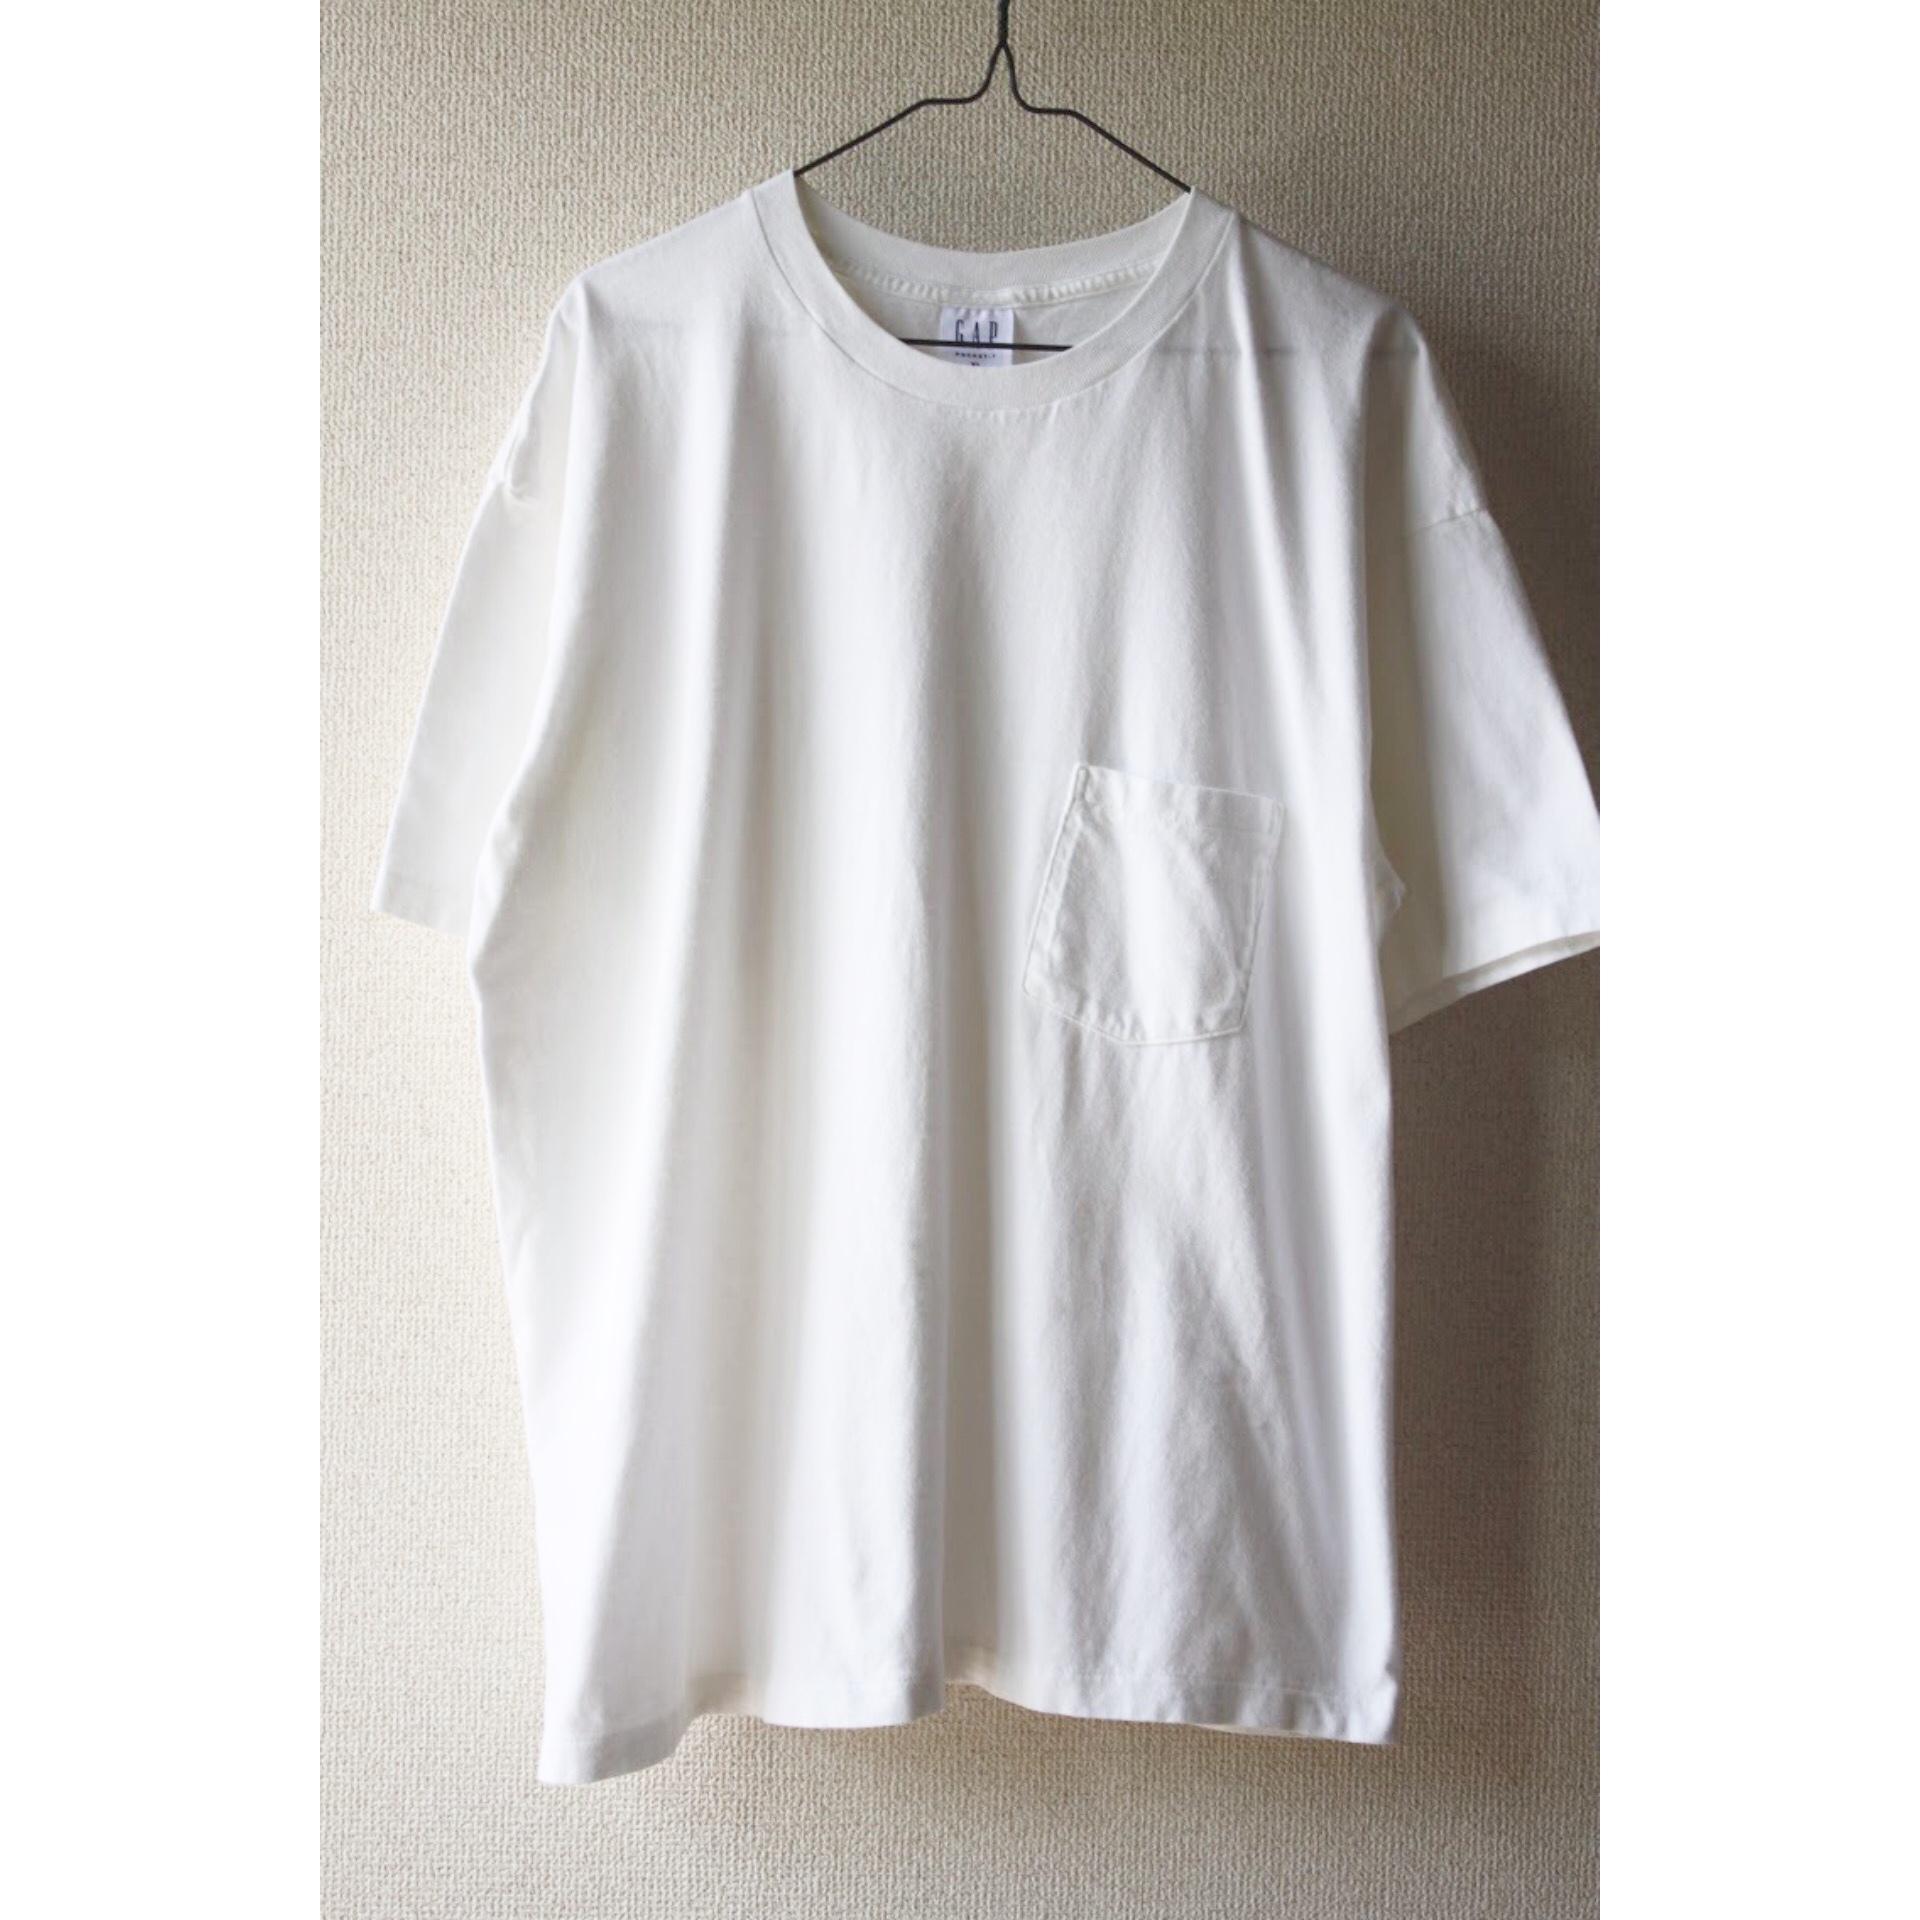 90s white pocket t shirt by GAP